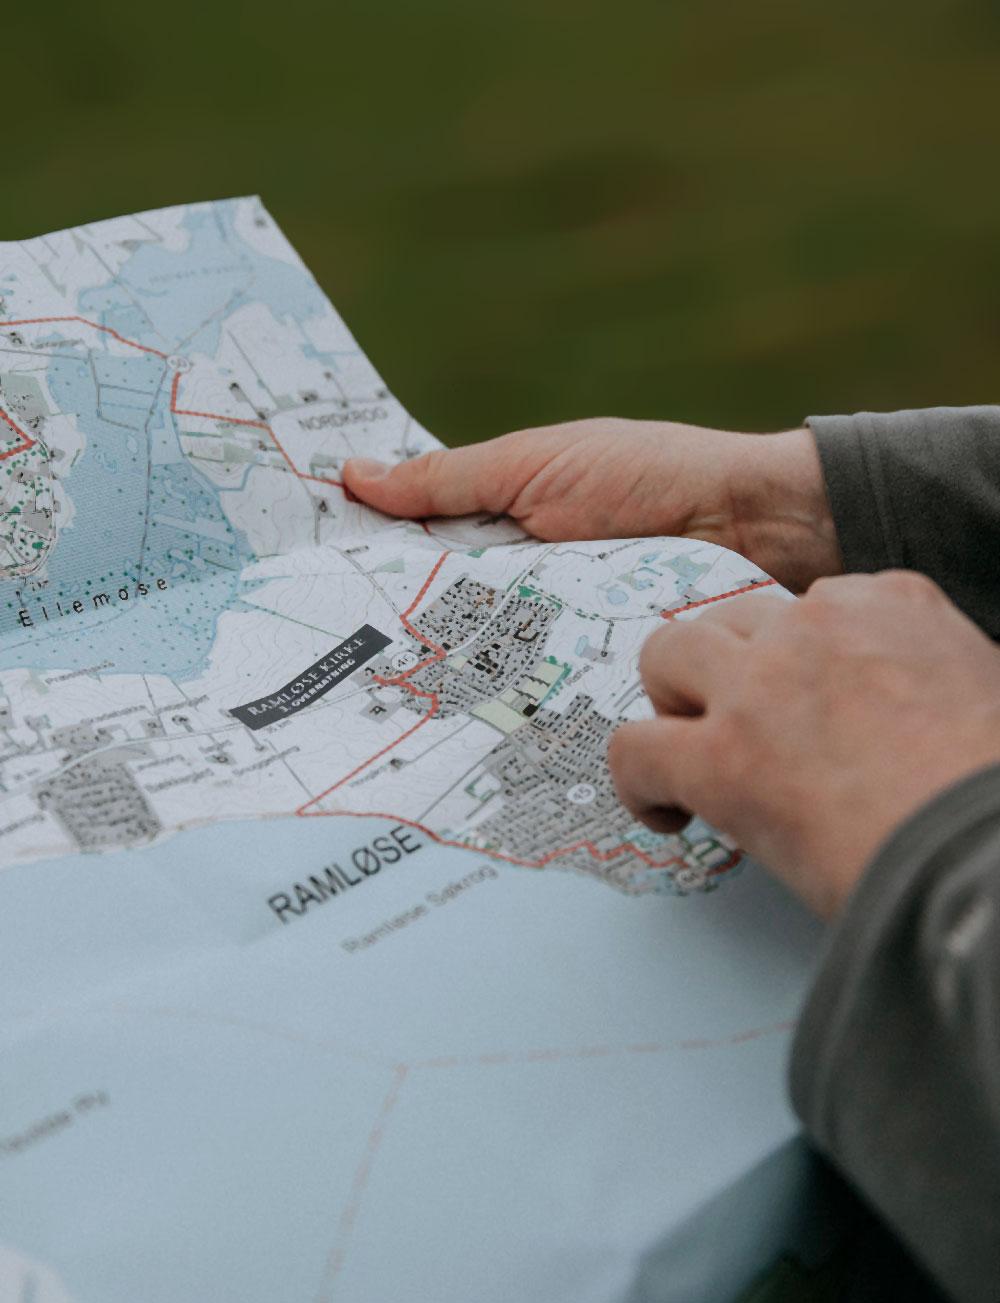 Vandretur på Sjælland: Kort